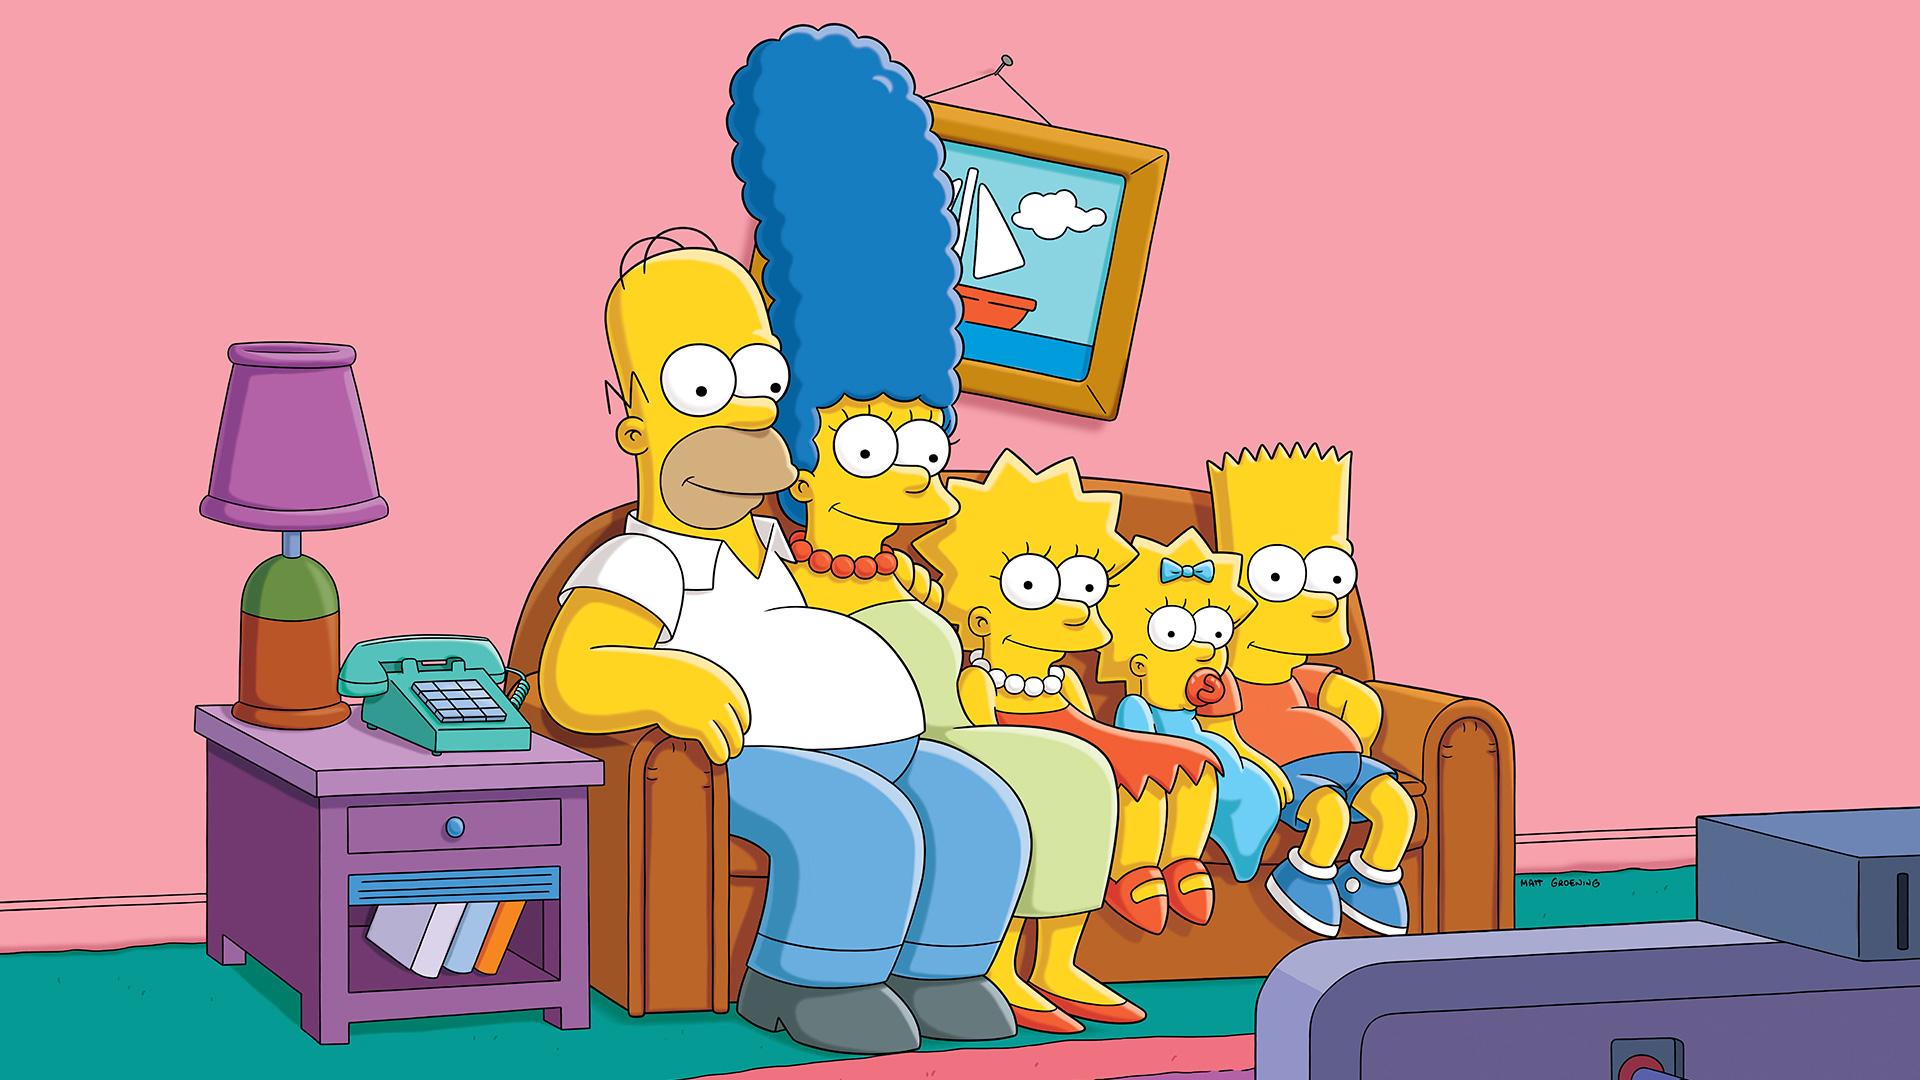 2560X1080 The Simpsons Original 2560X1080 Resolution Hd 4K -6568